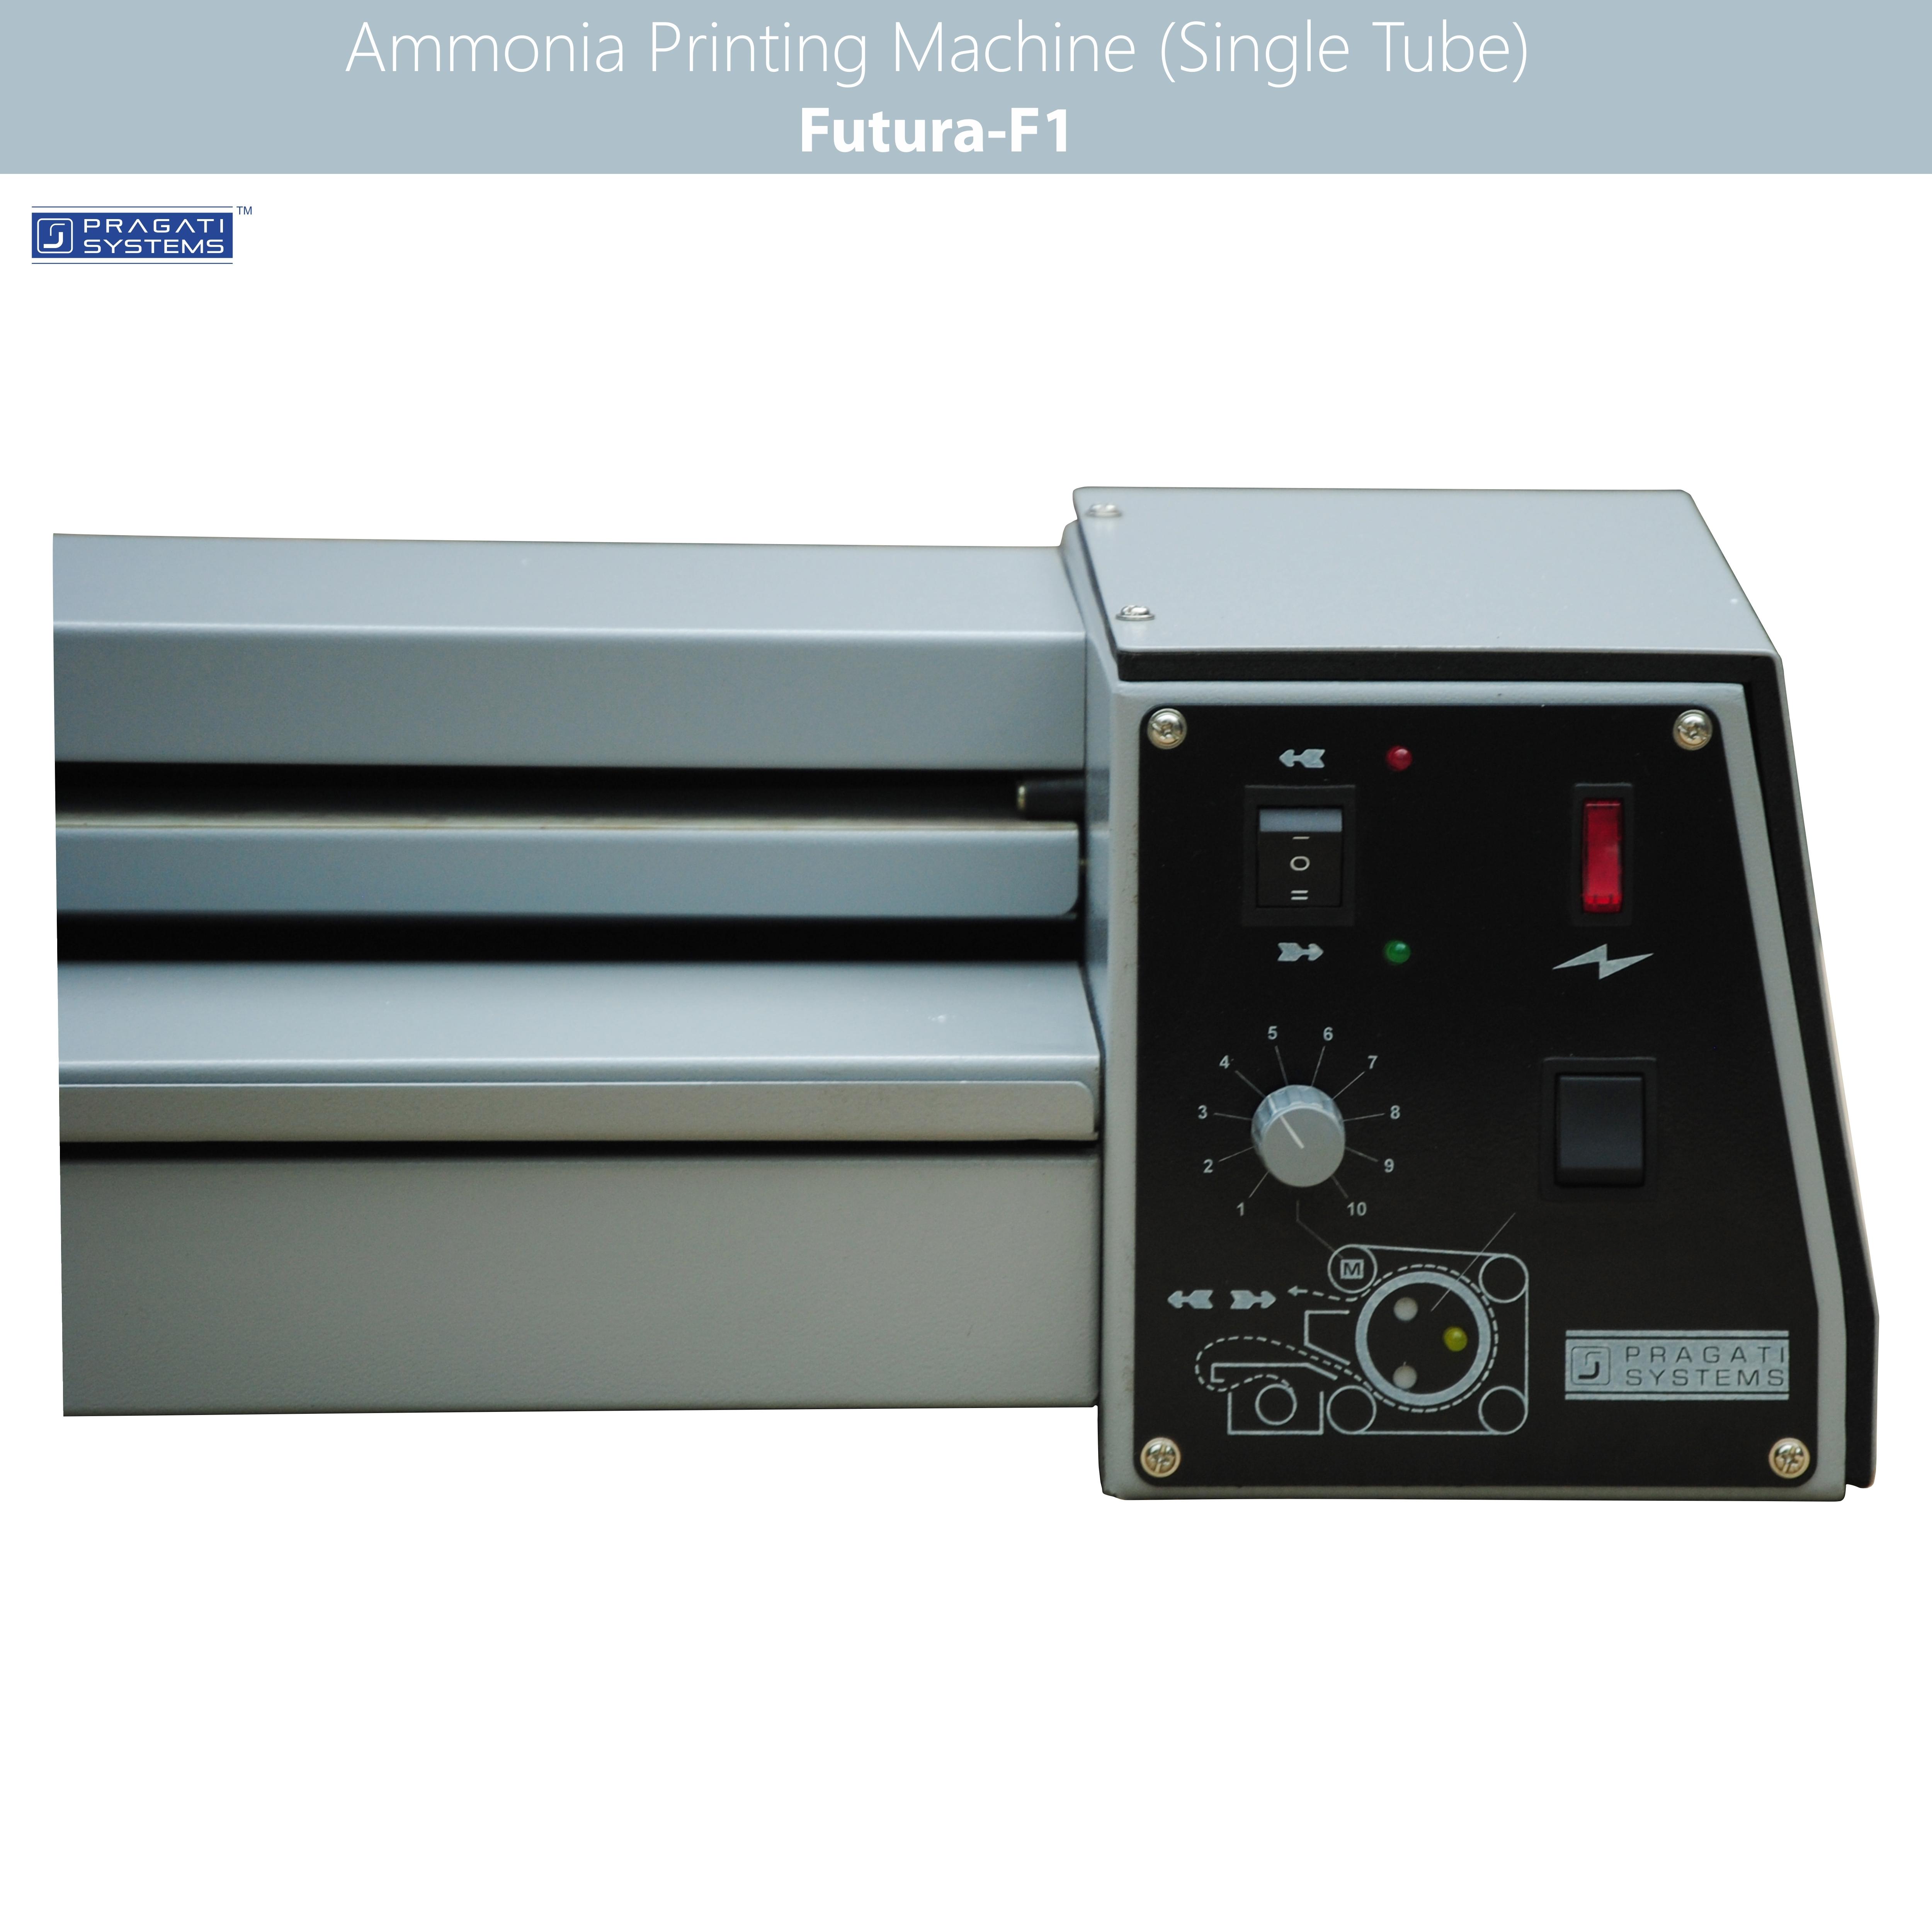 Ammonia Printing & Drafting Machine - Single Tube